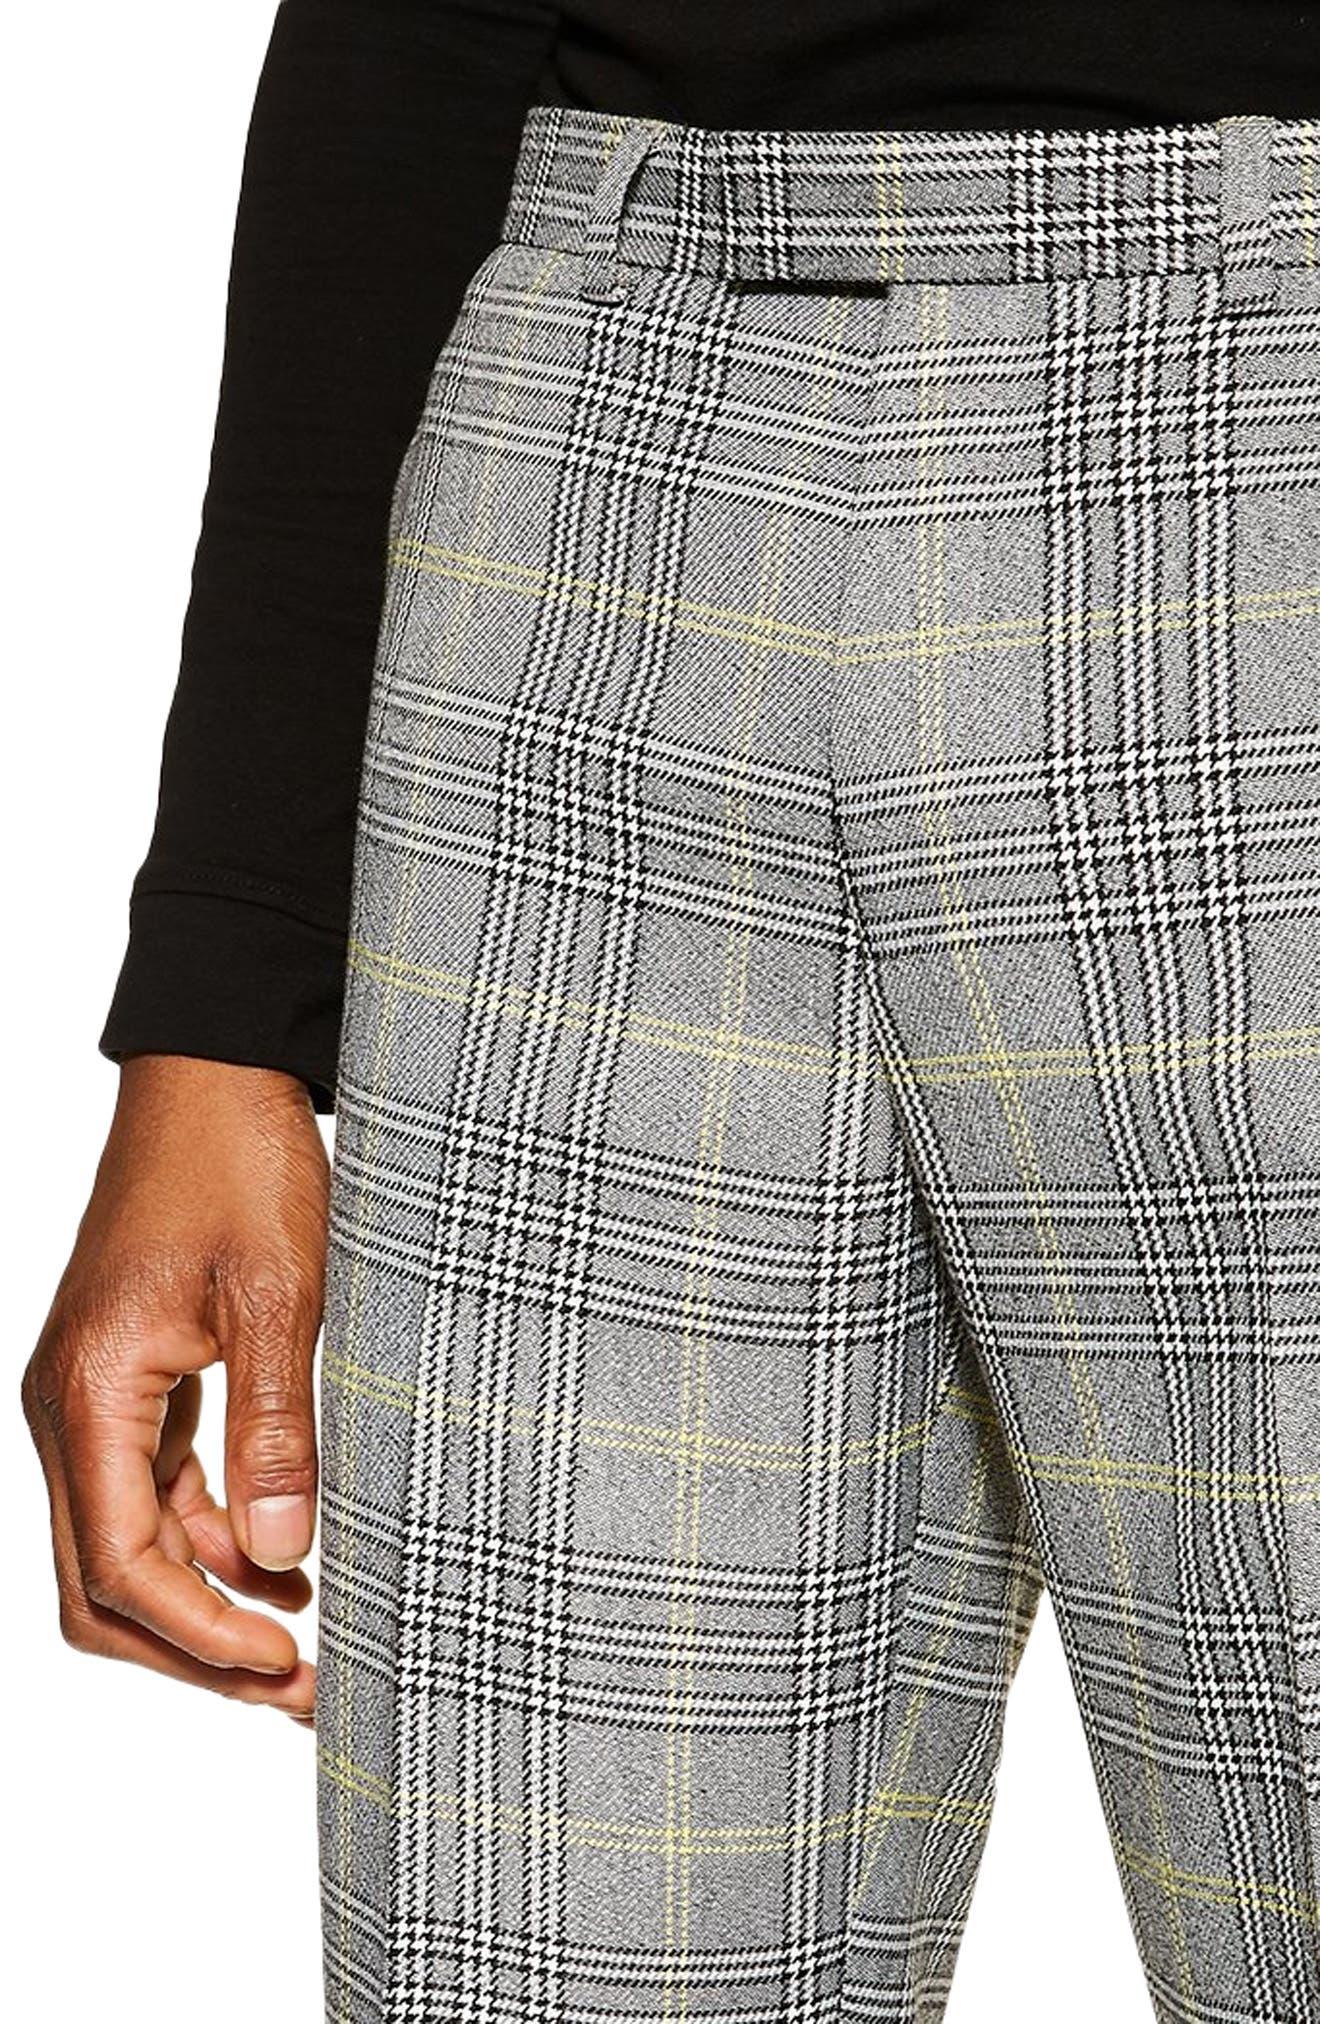 TOPMAN, Check Slim Trousers, Alternate thumbnail 4, color, GREY